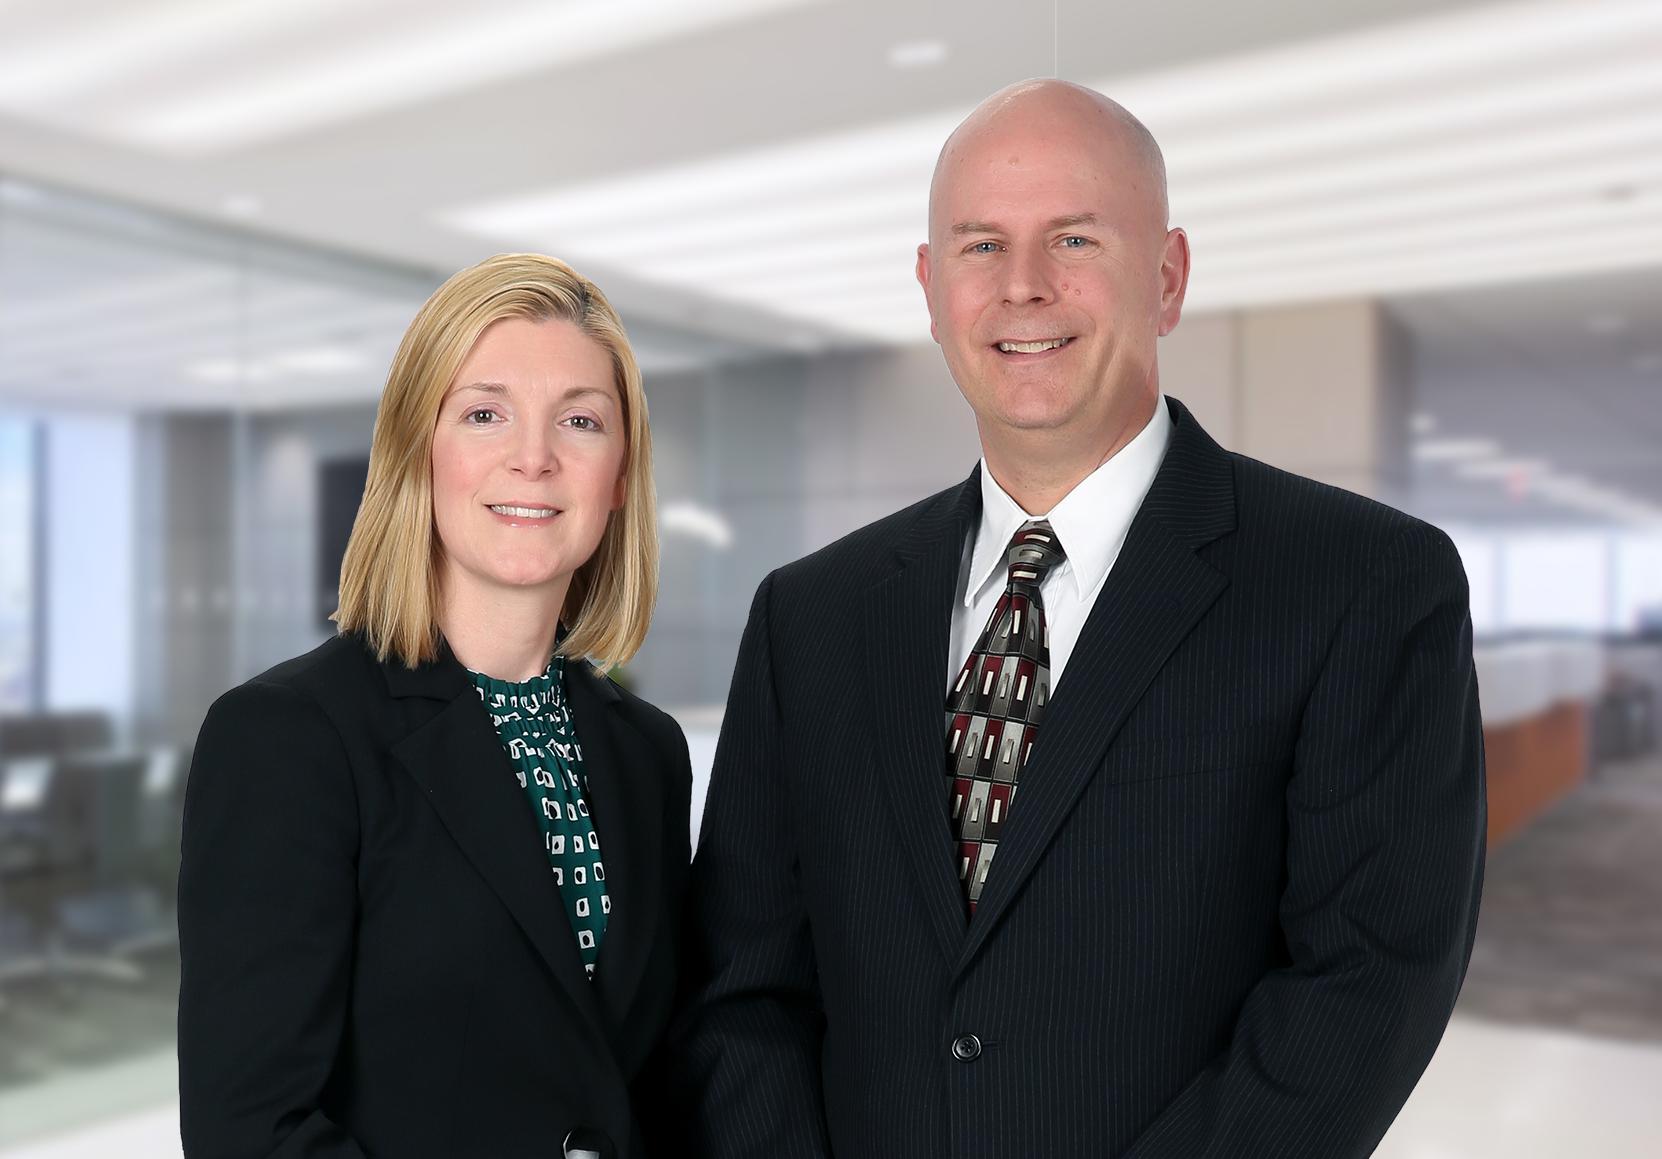 Judge-Trevethan Wealth Advisors Profile Photo